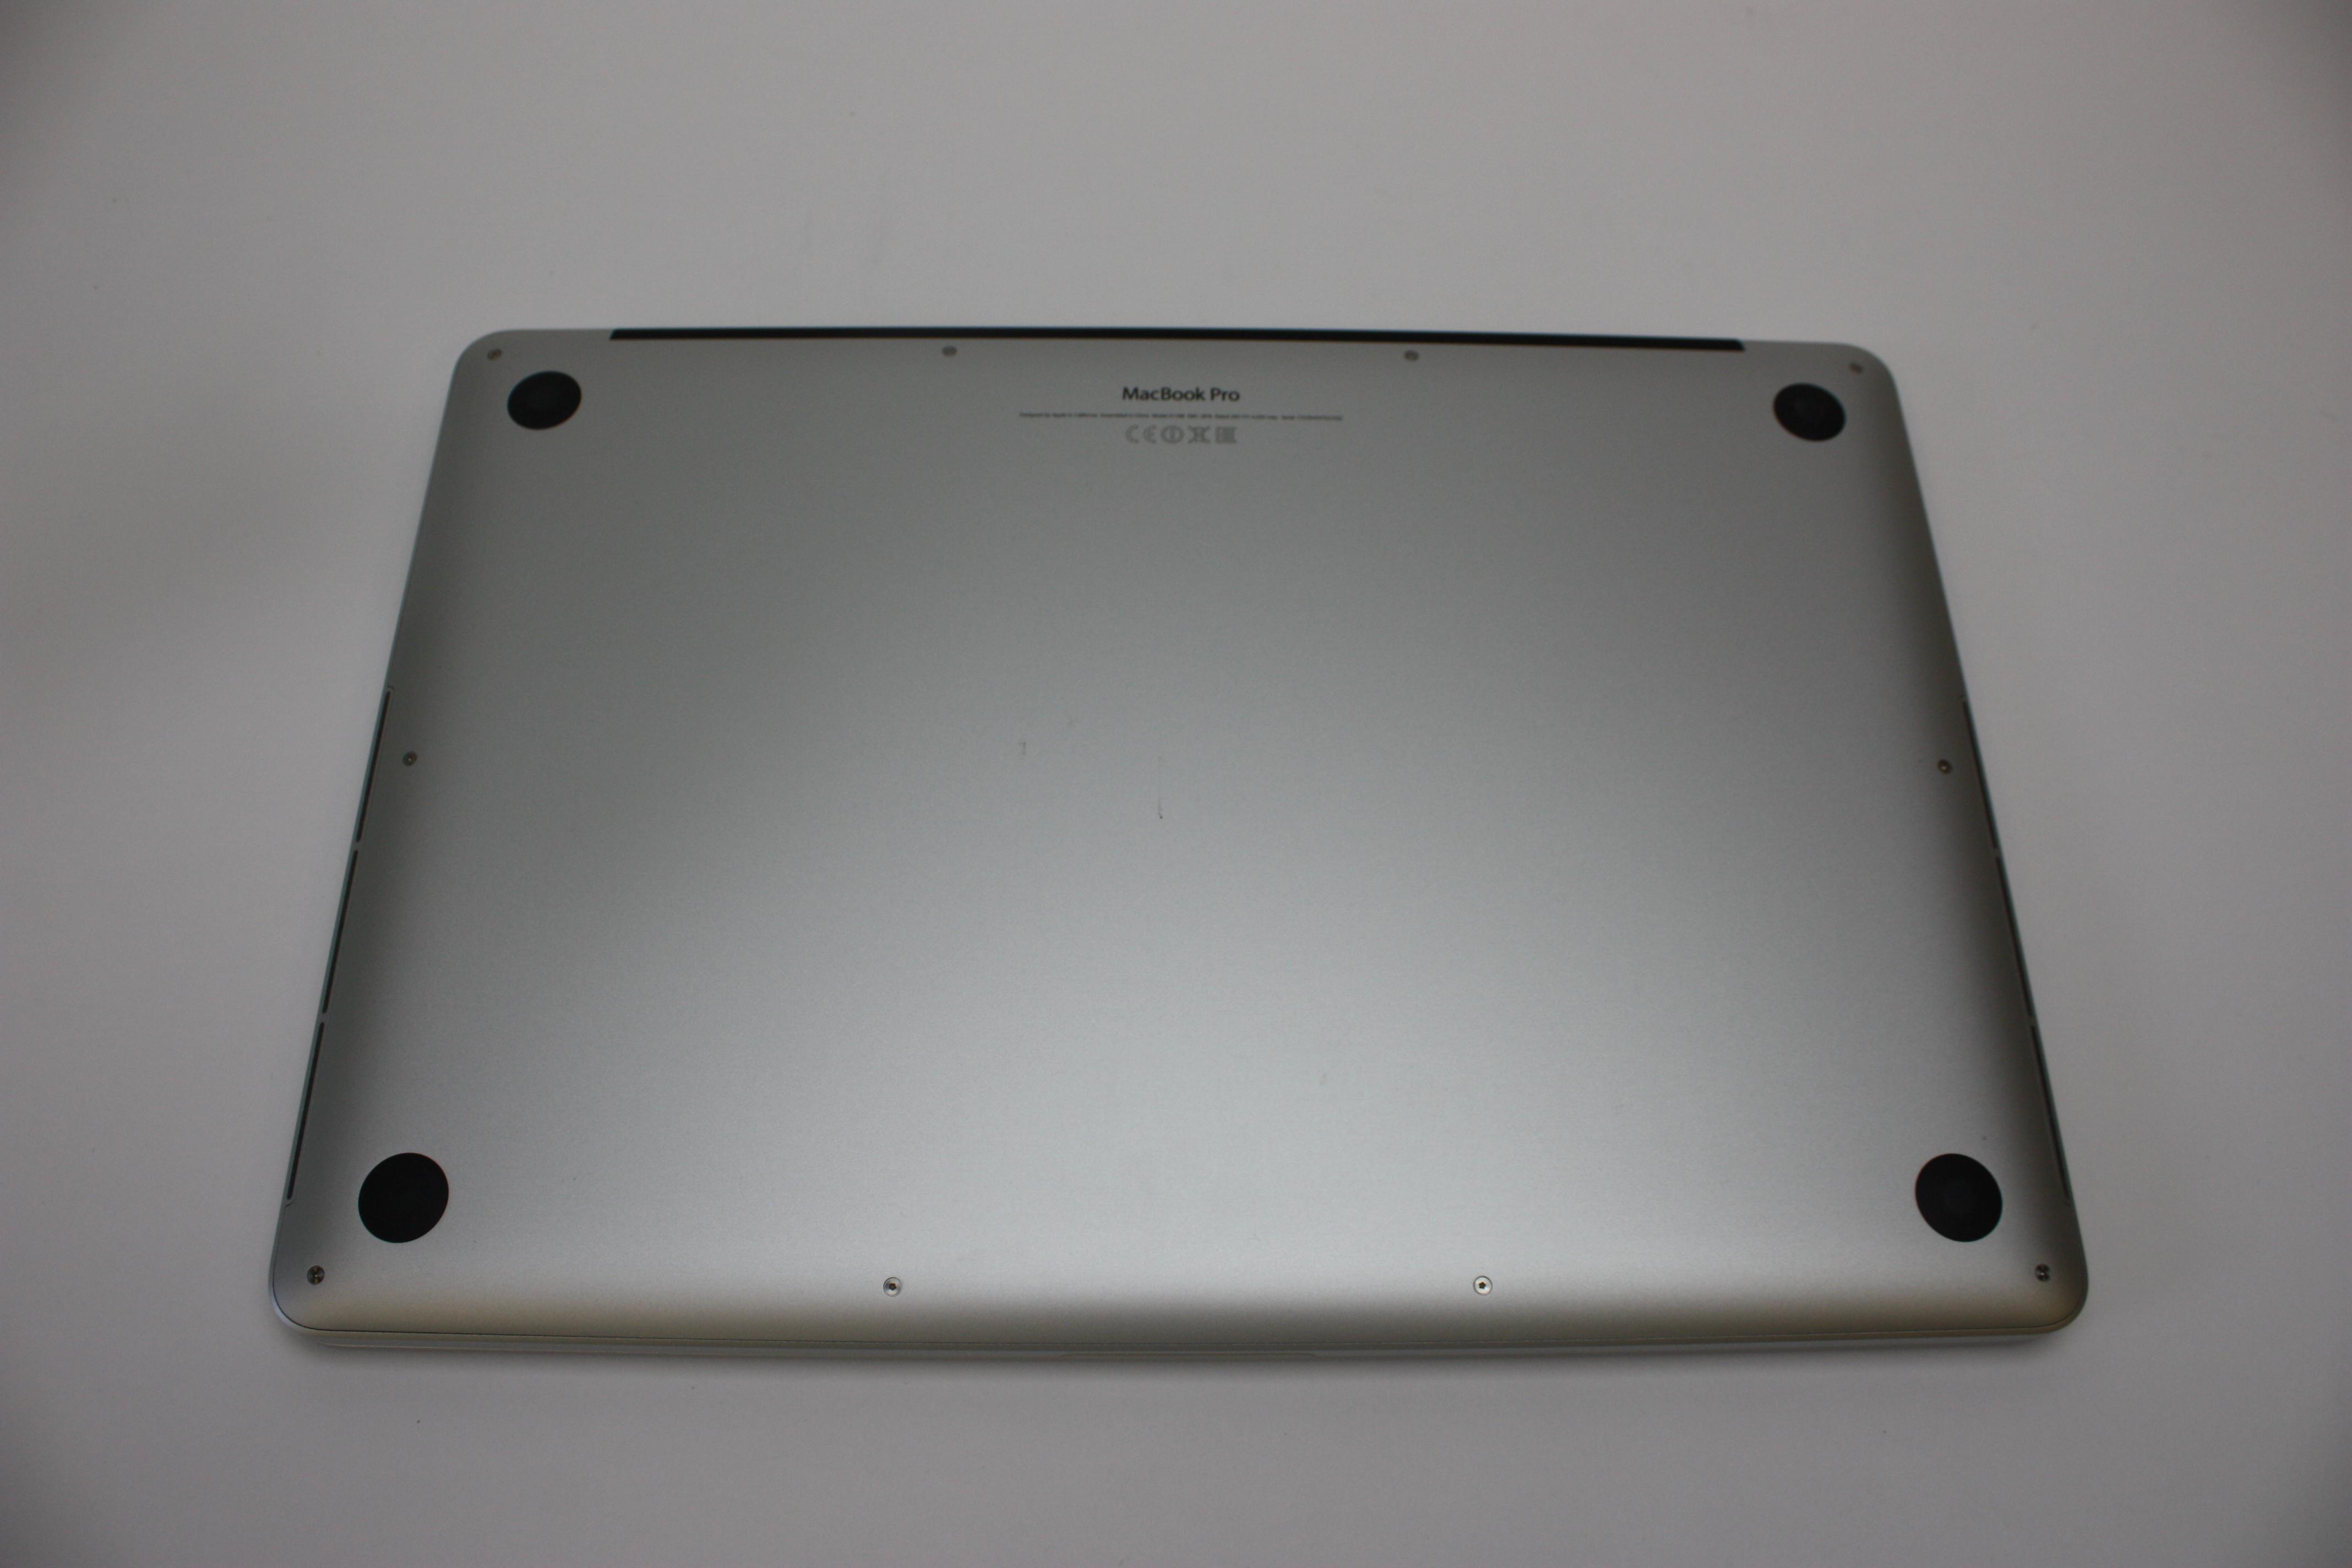 MacBook Pro 15-inch Retina, 2.2 GHz Intel Core i7, 16 GB 1600 MHz DDR3, 256 GB Flash Storage, image 8